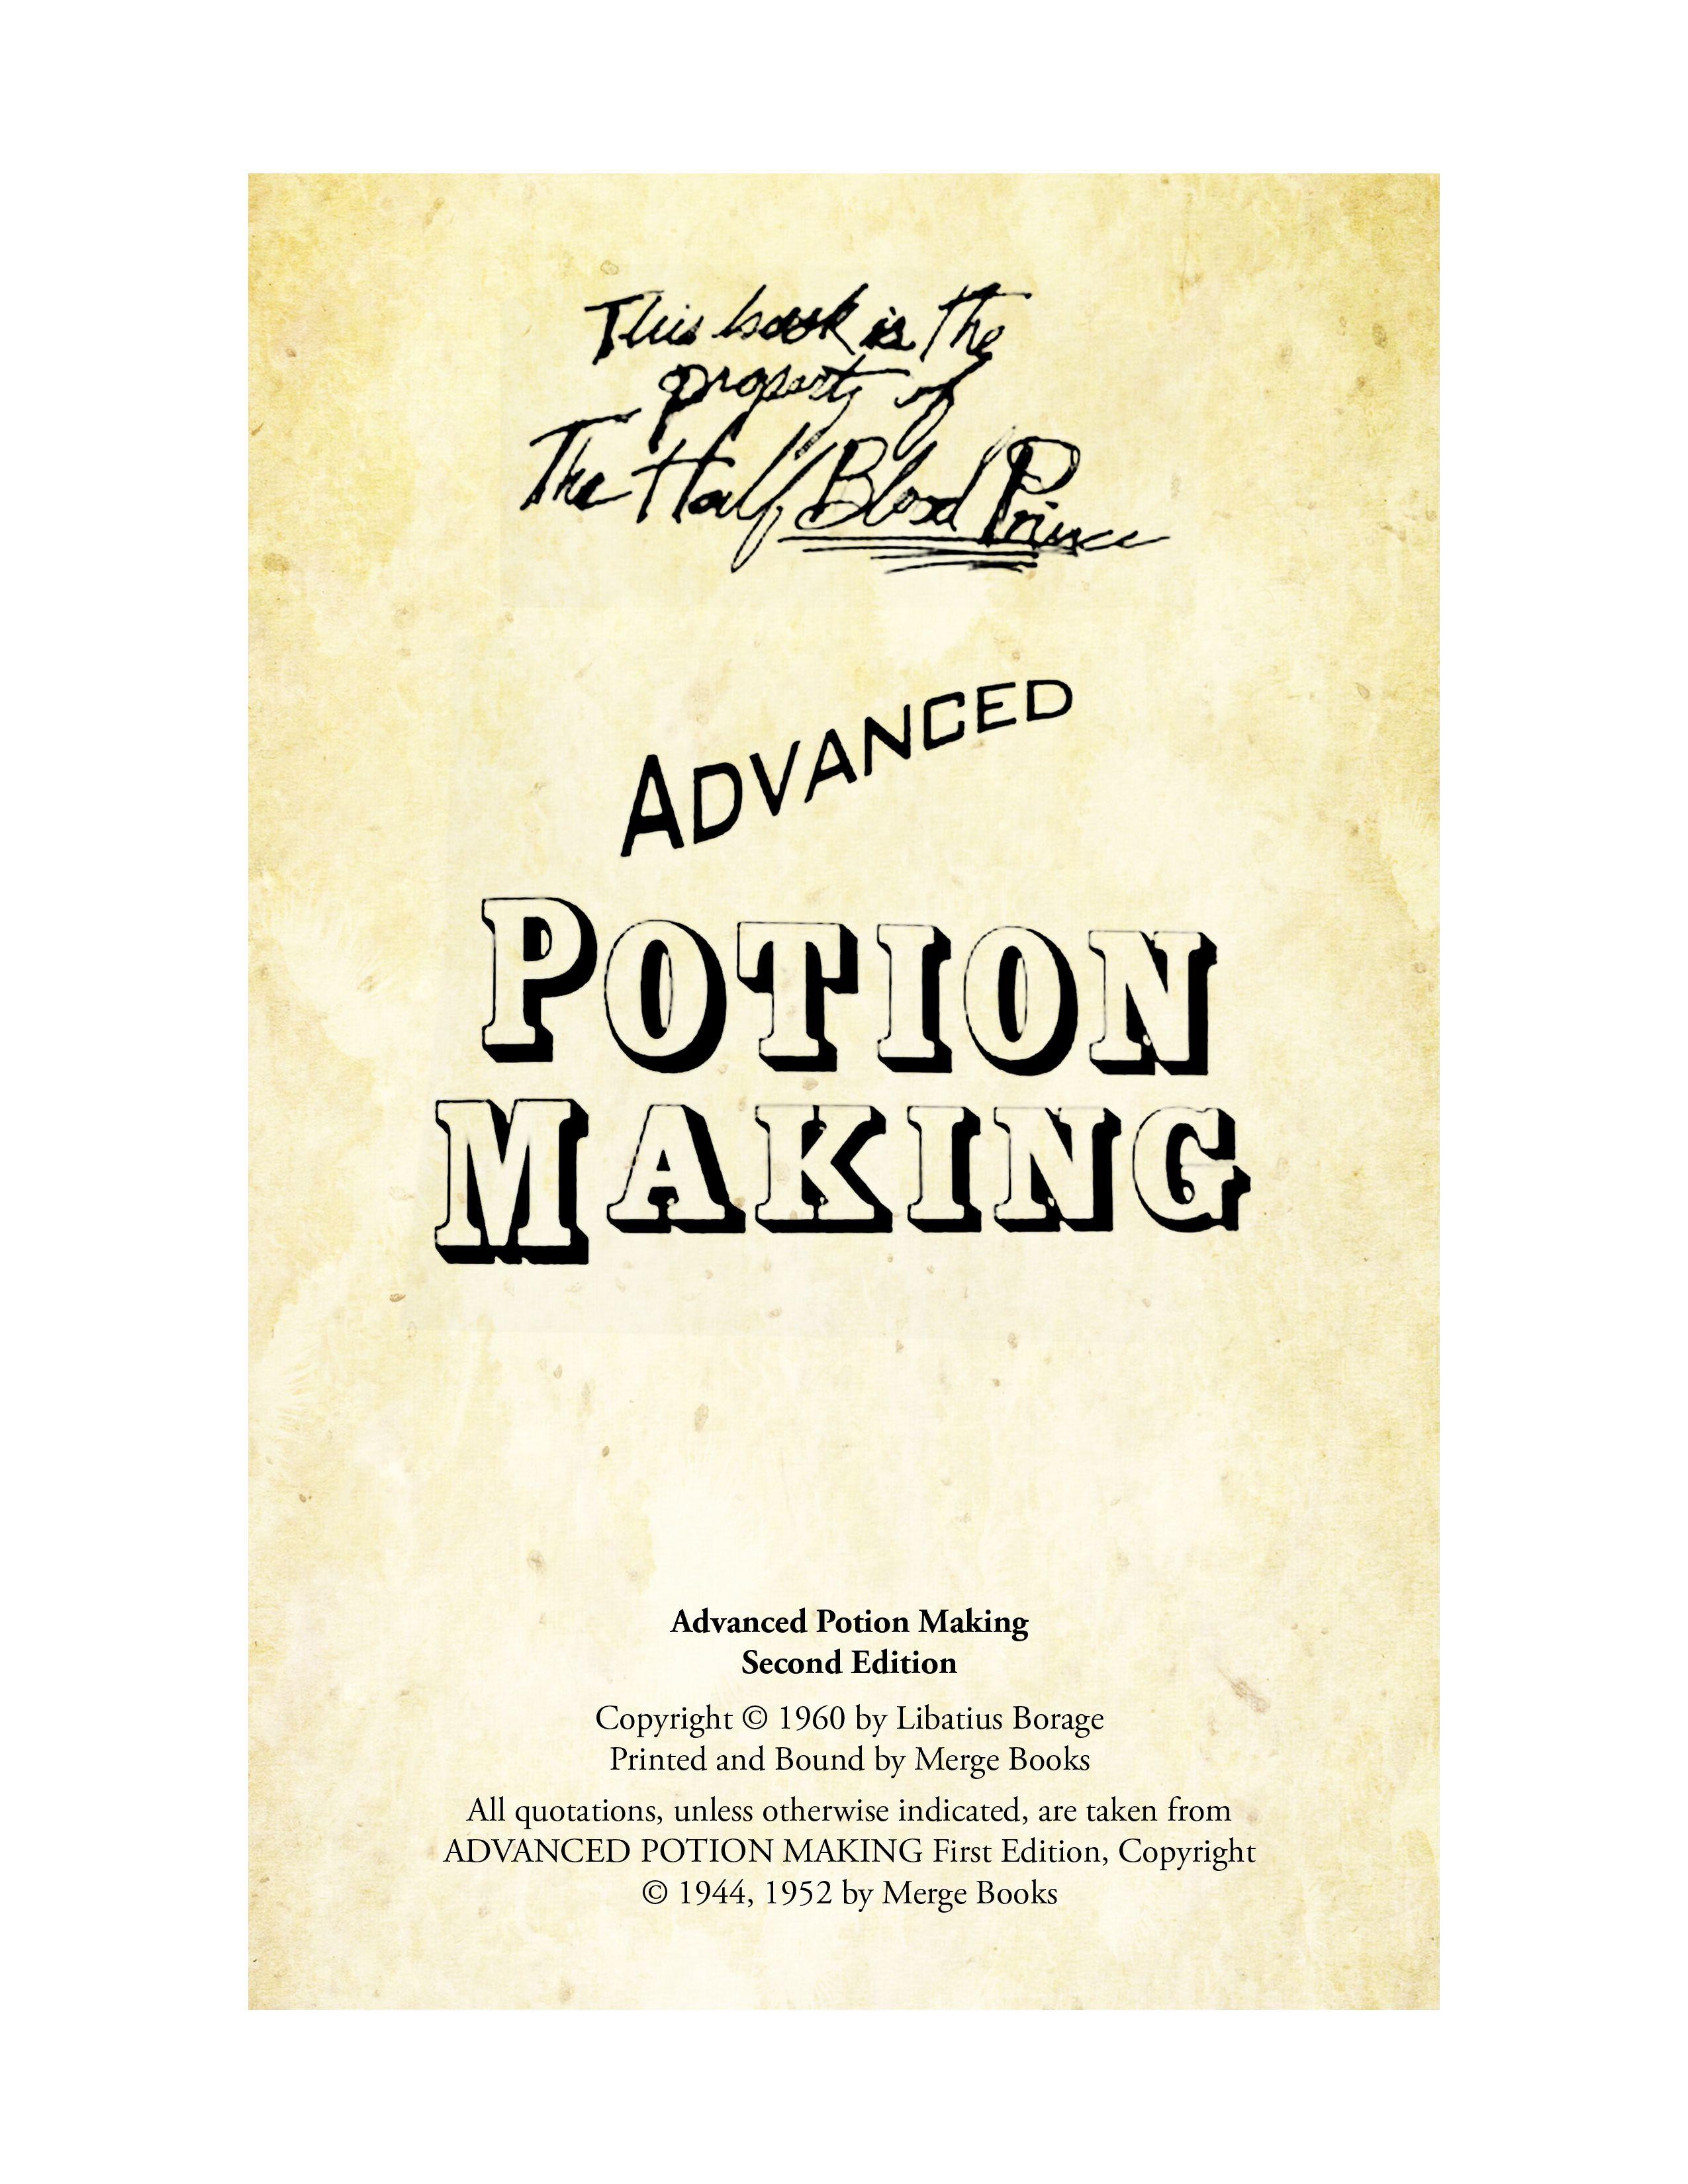 Advanced Potion Making Page 1